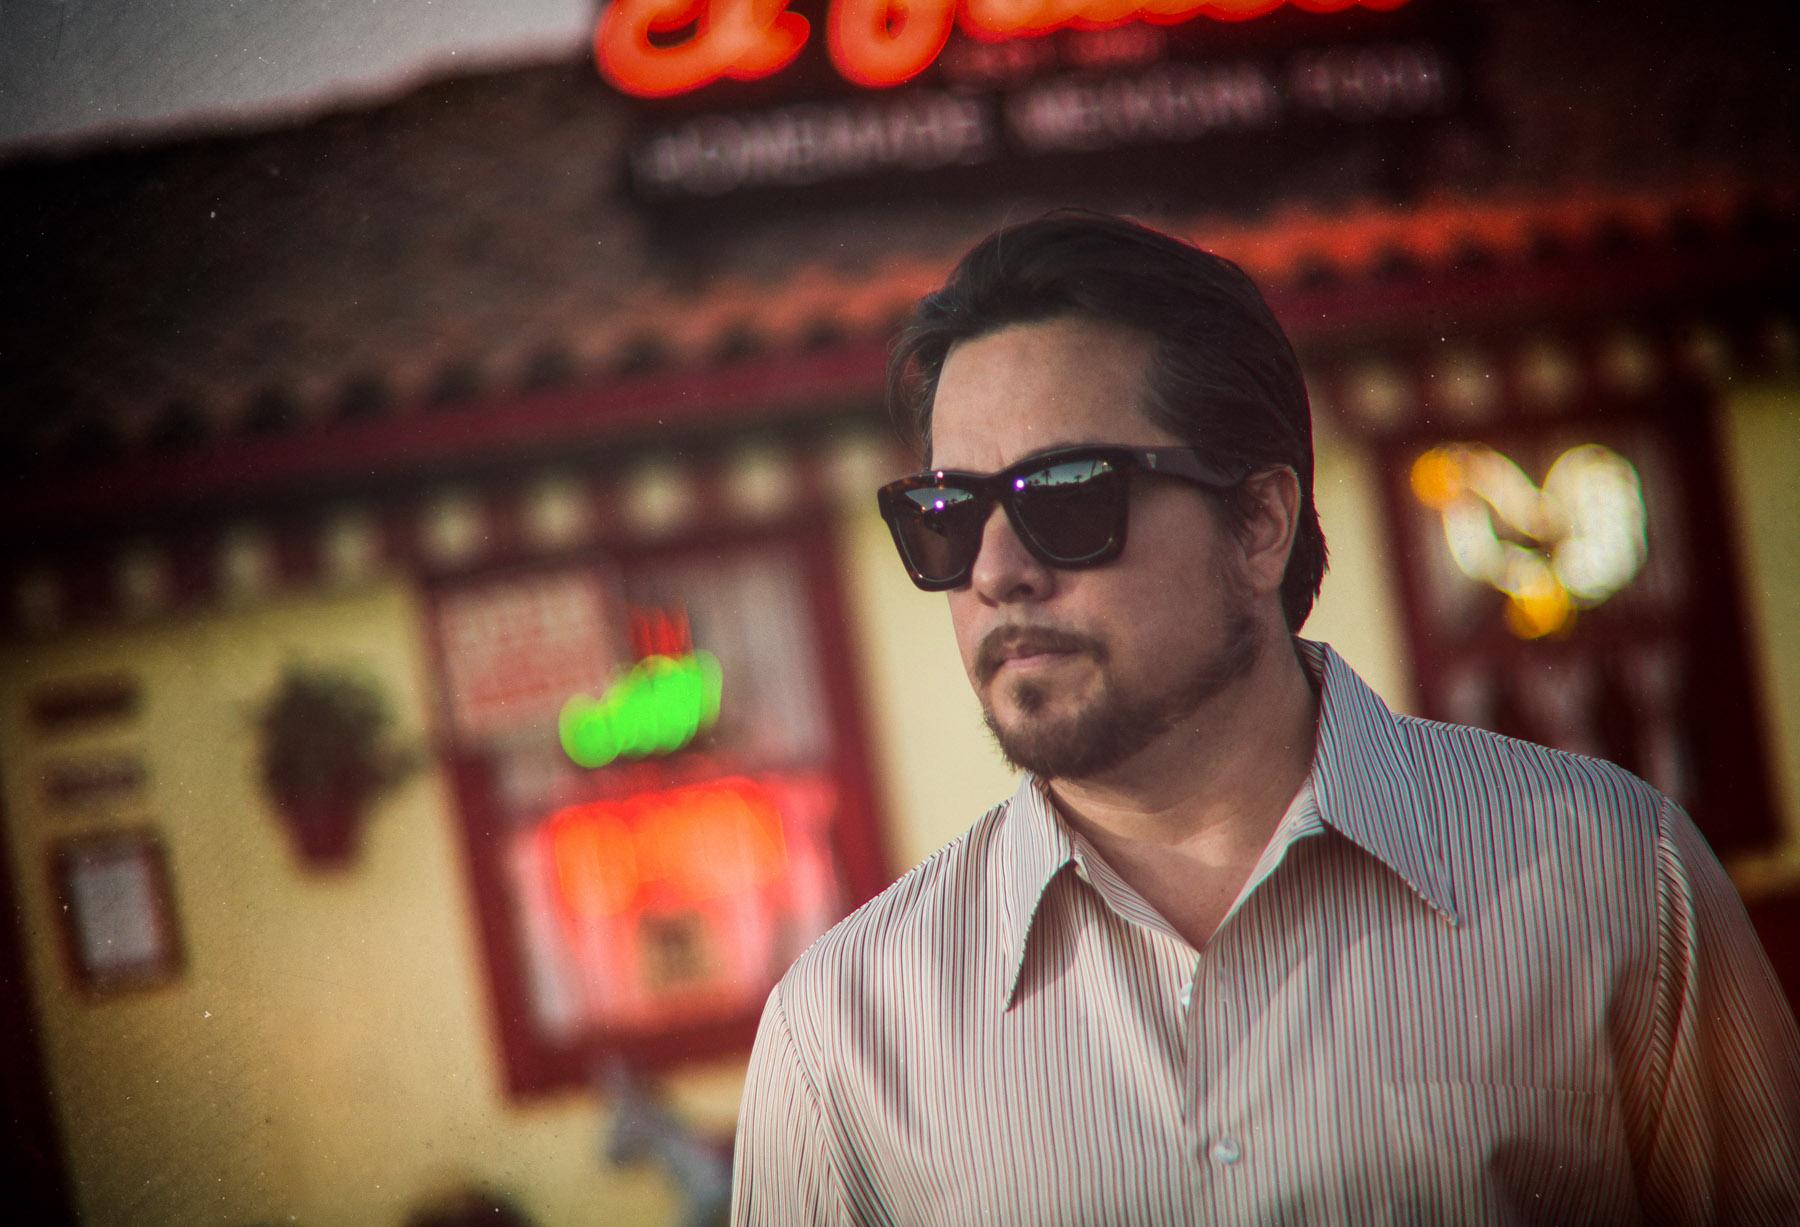 Hear Ex-Kyuss Singer John Garcia's Duet With the Doors' Robby Krieger